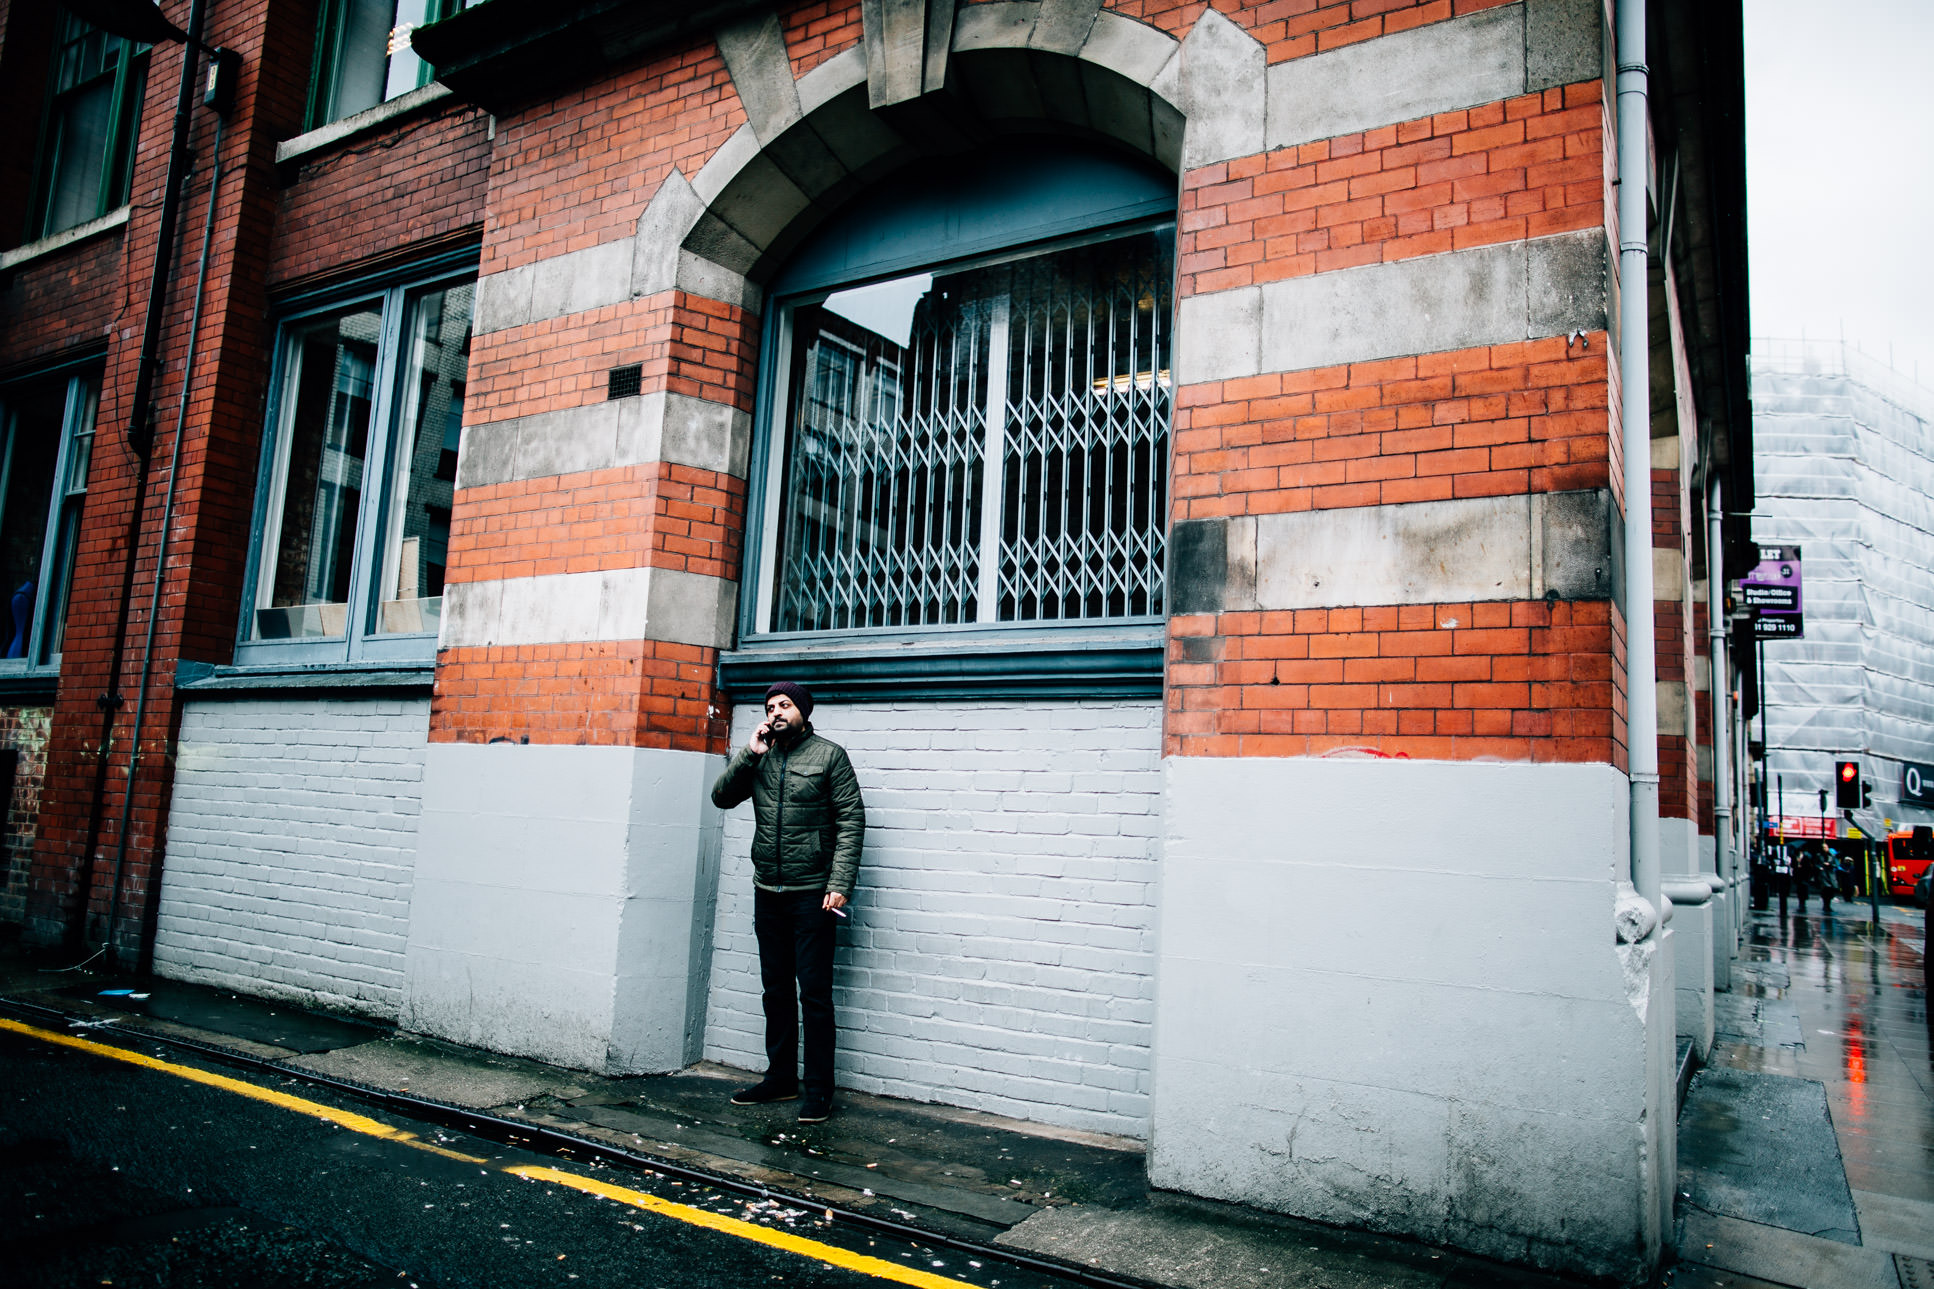 Street Photography11